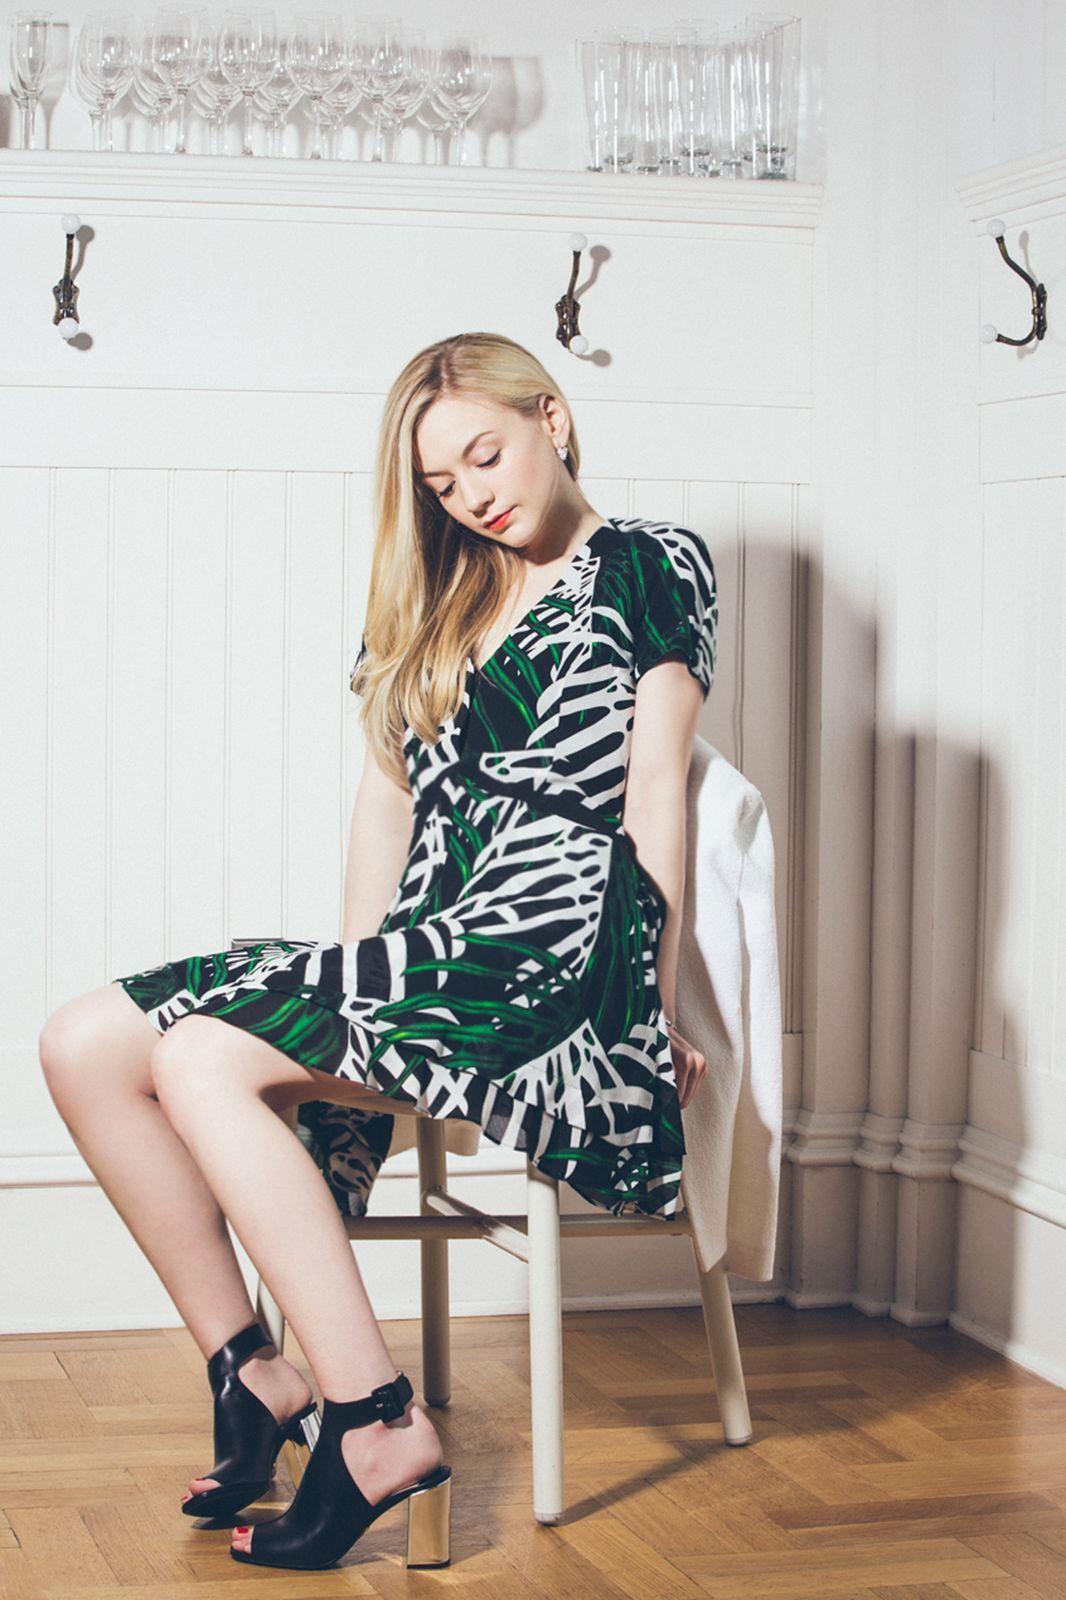 Wallpaper Face Model Collage Lauren Cohan Fashion Ultrawide Emily